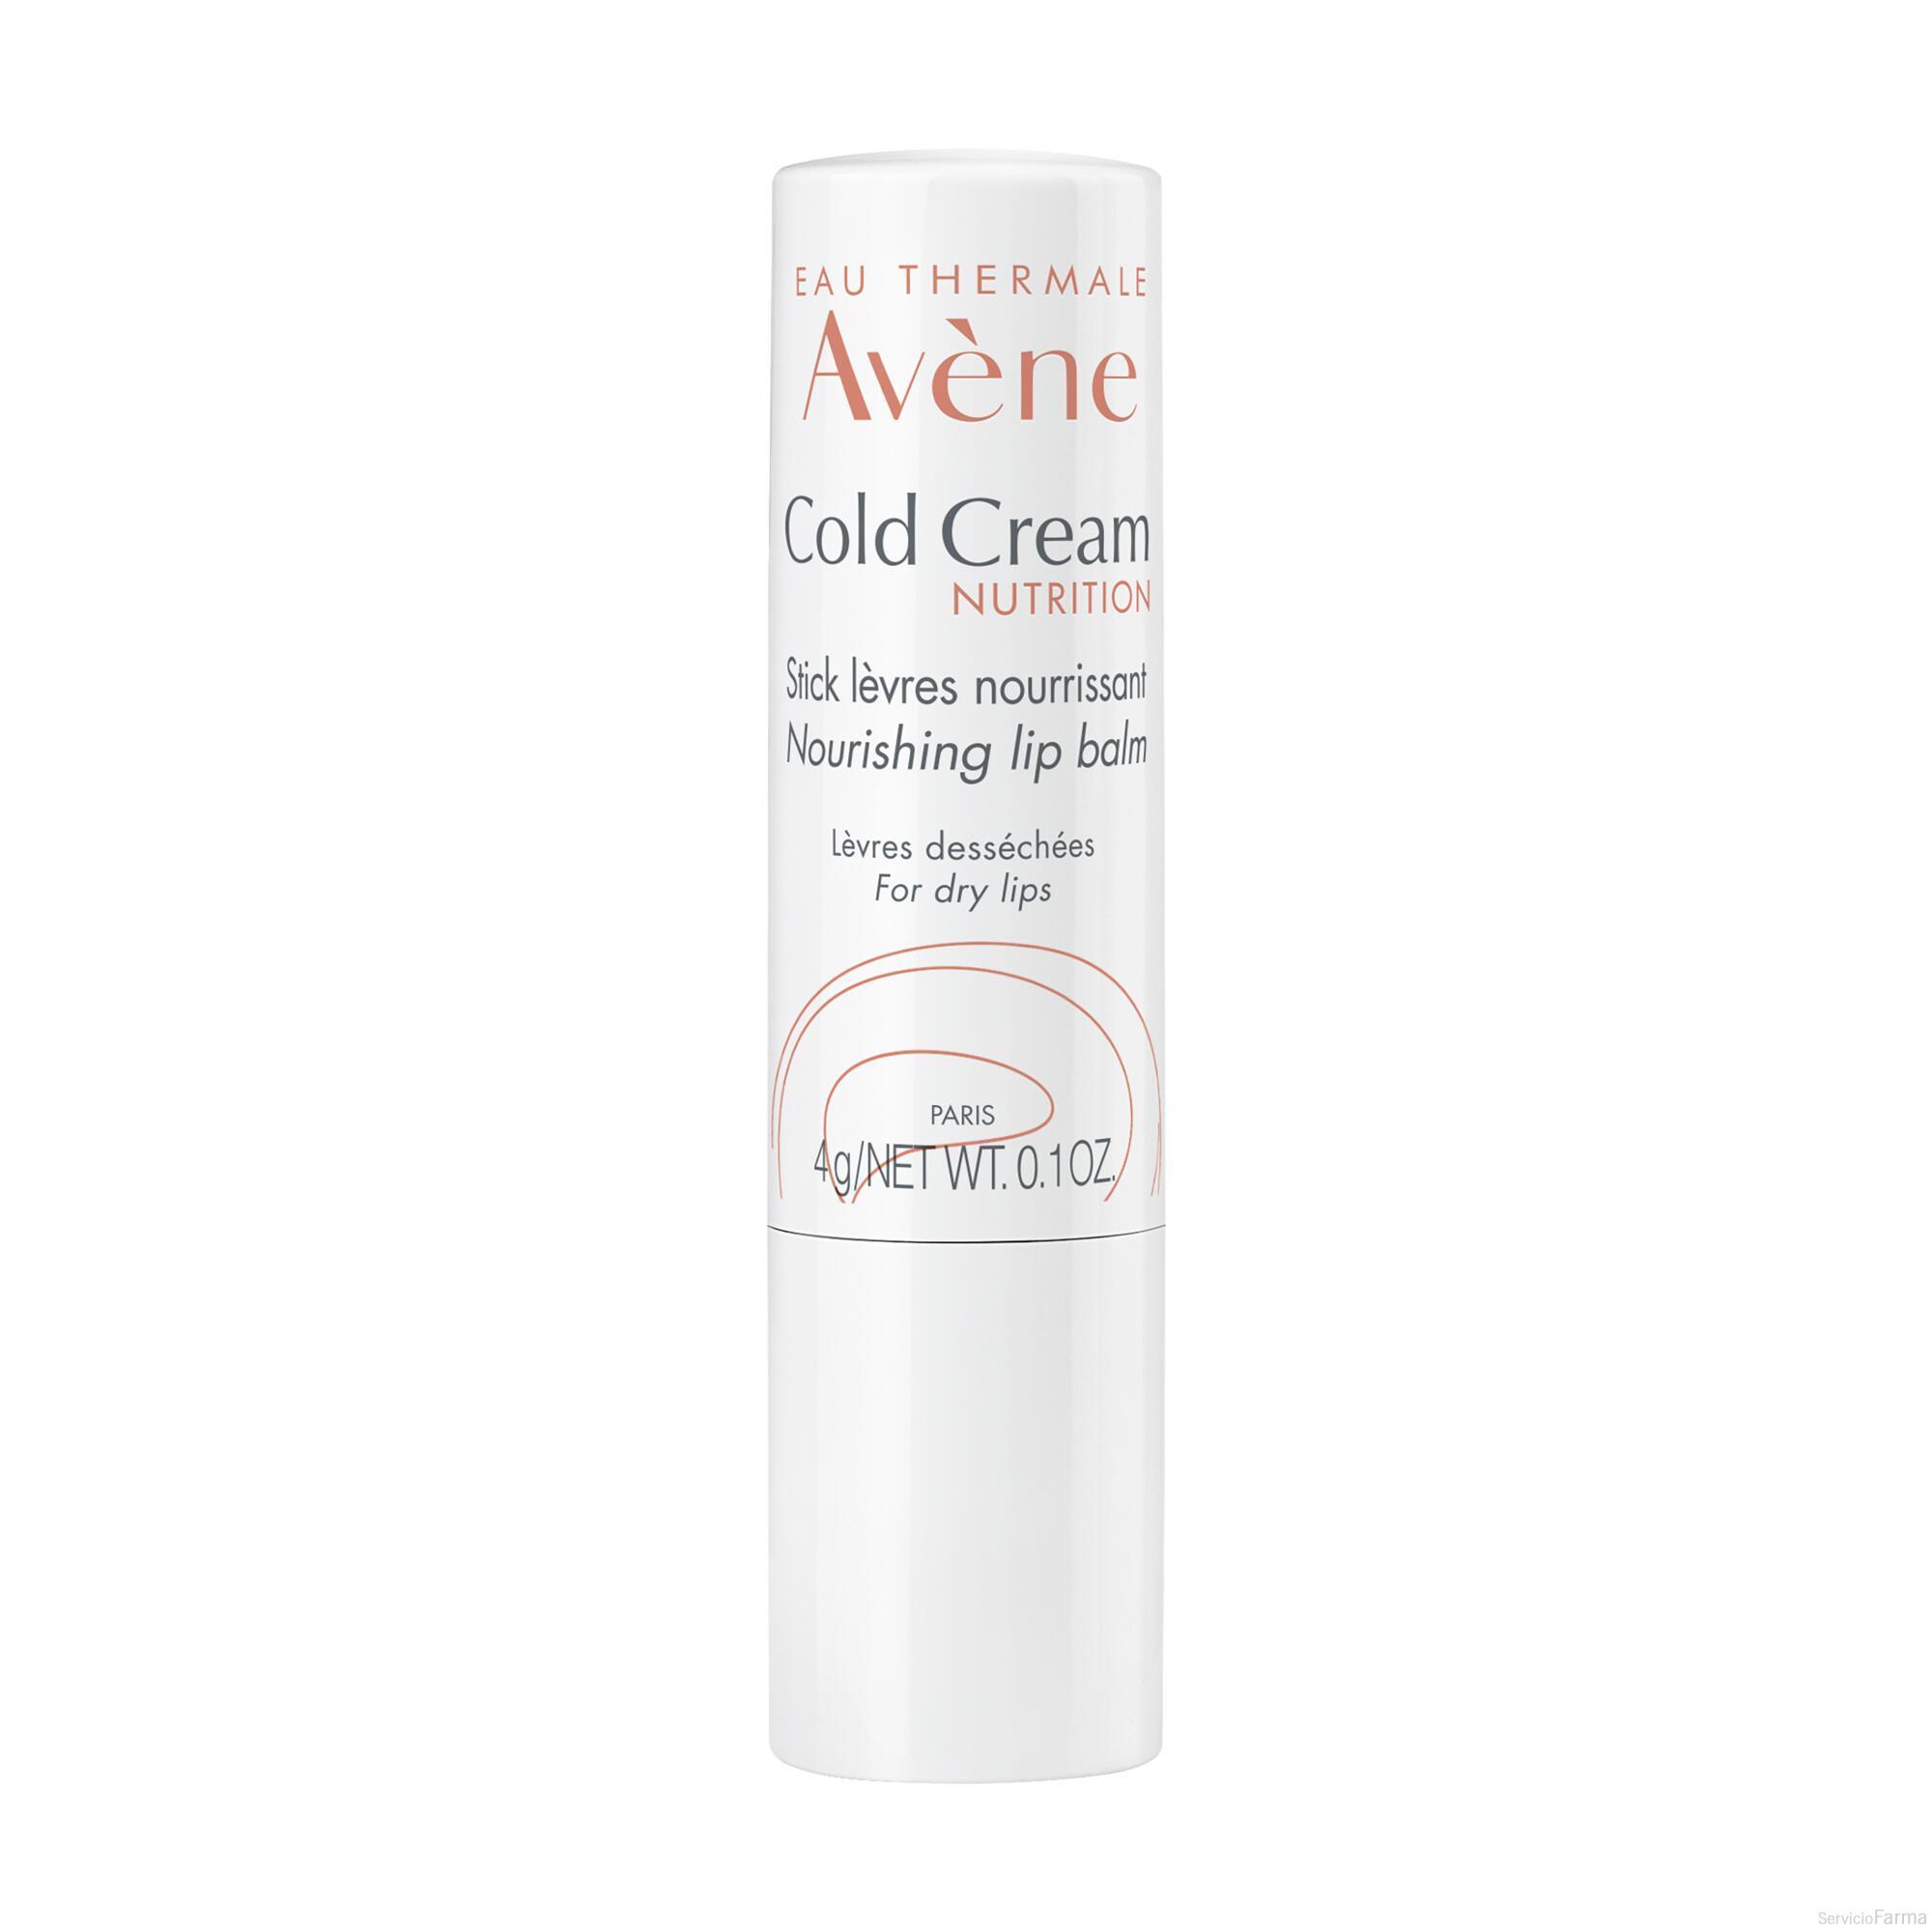 Avene Stick Labial Cold Cream 4 g